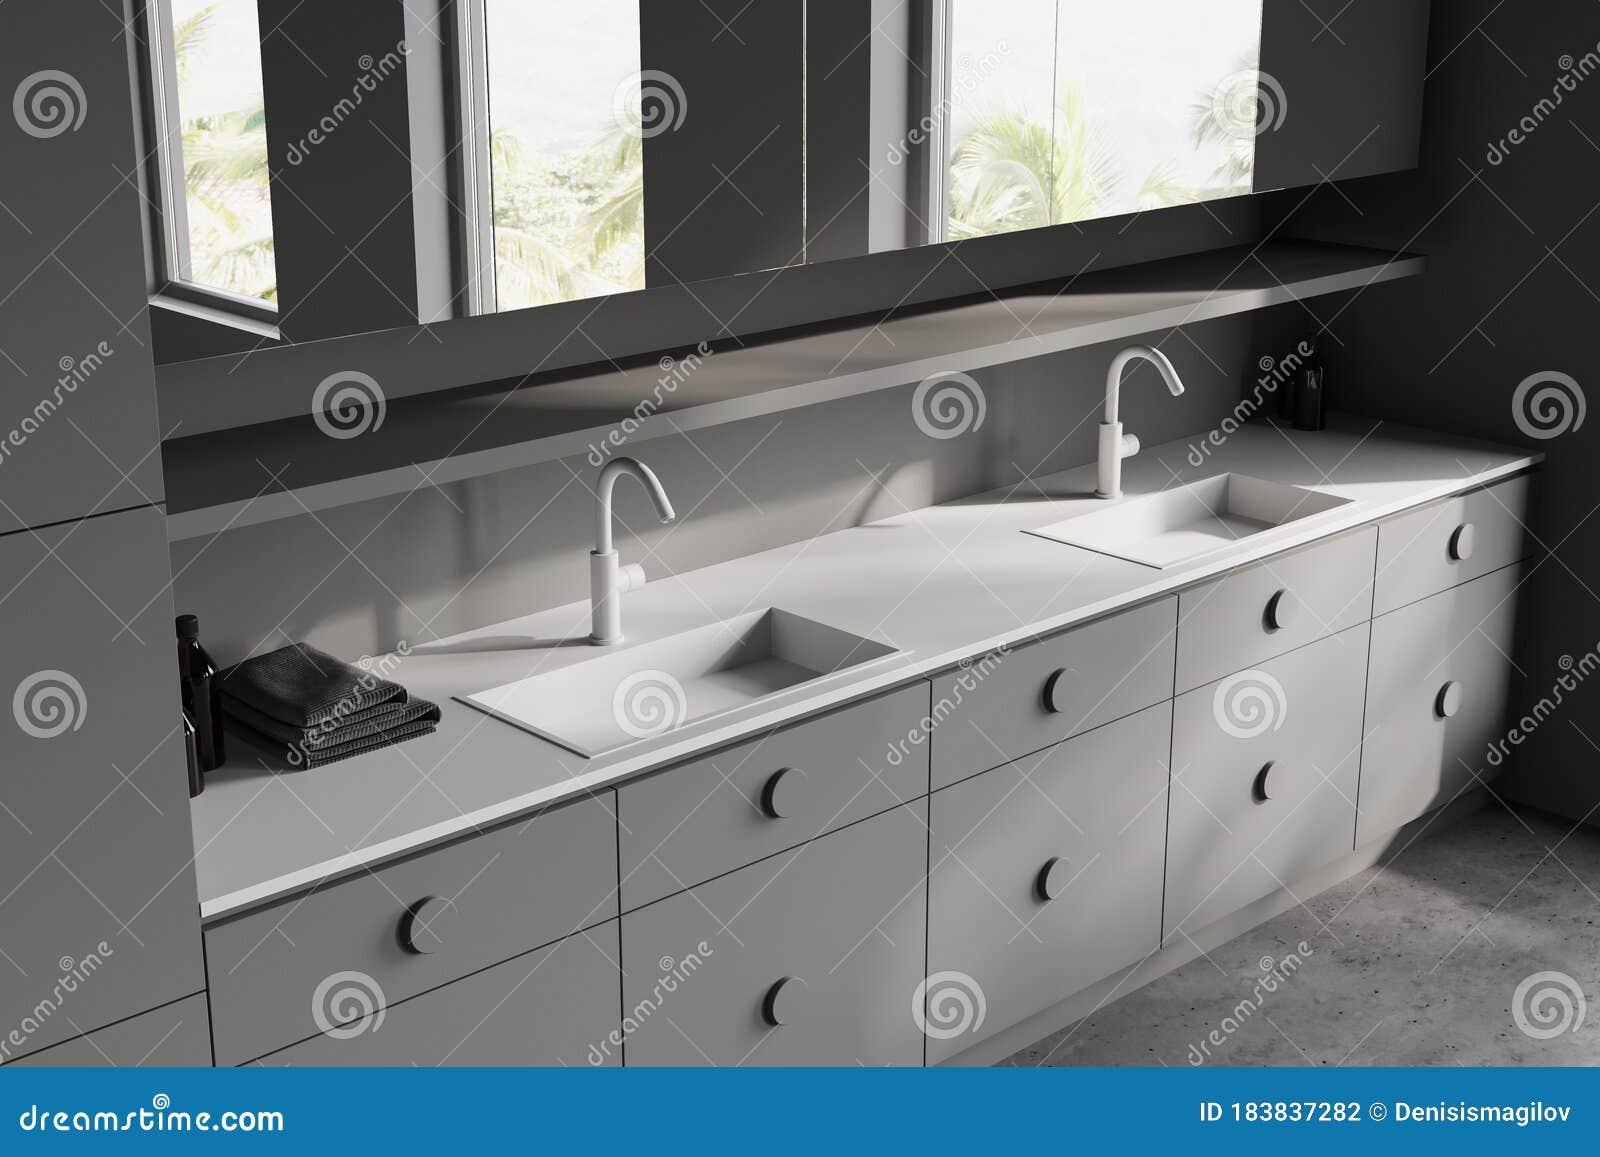 Grey Bathroom Corner With Double Sink Stock Illustration Illustration Of Floor Decor 183837282